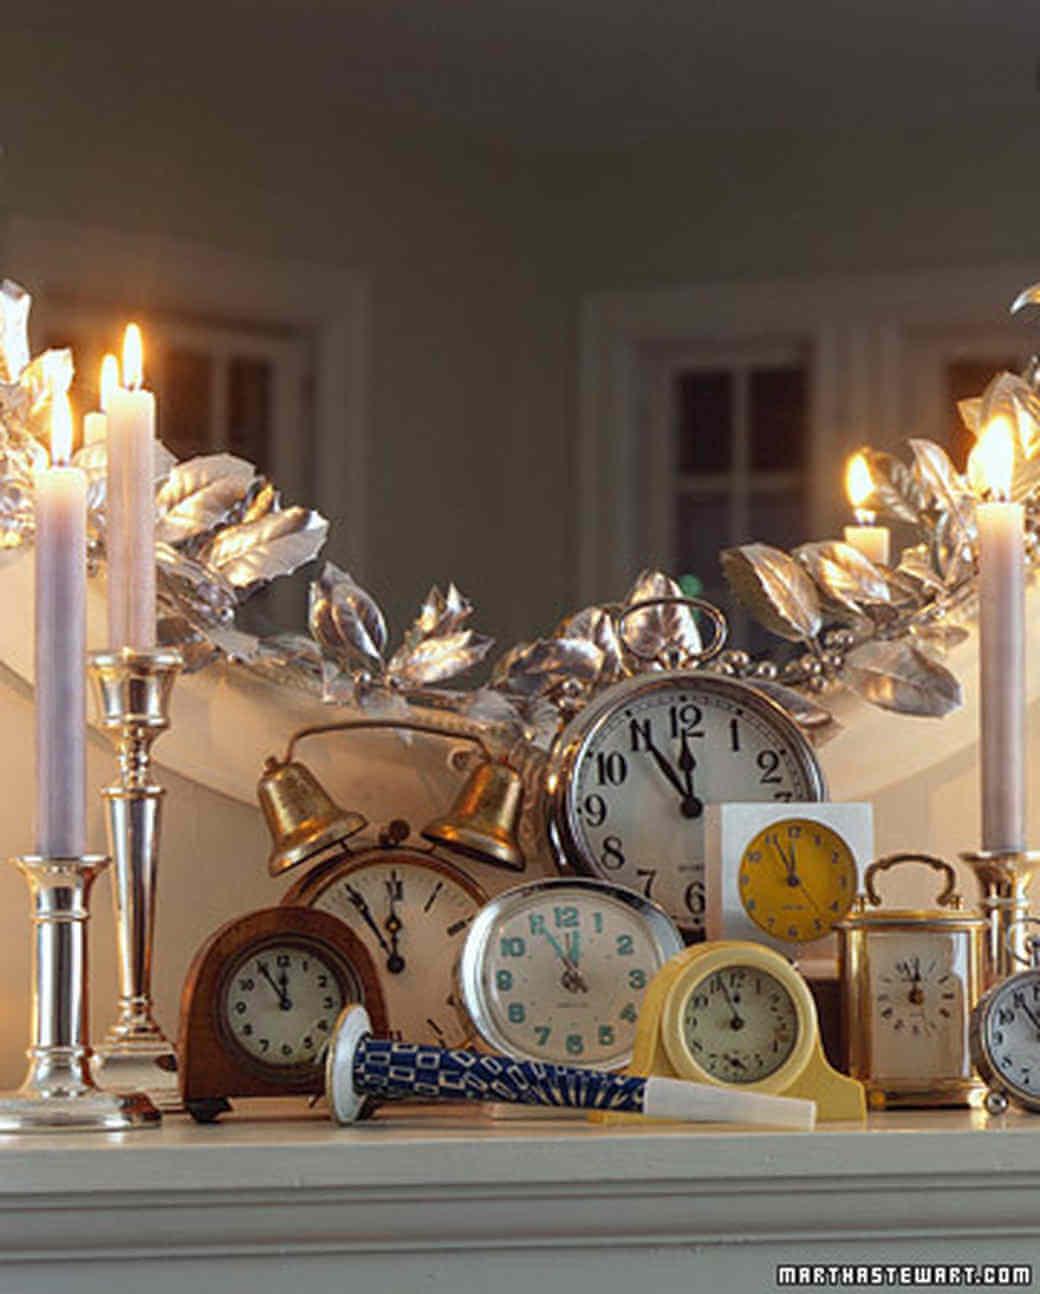 15 Silvester Dekoideen - Partydeko Ideen - Silvesterparty - DIY Dekoideen zum Selbermachen - Silvester dekorieren - Party Deko Ideen